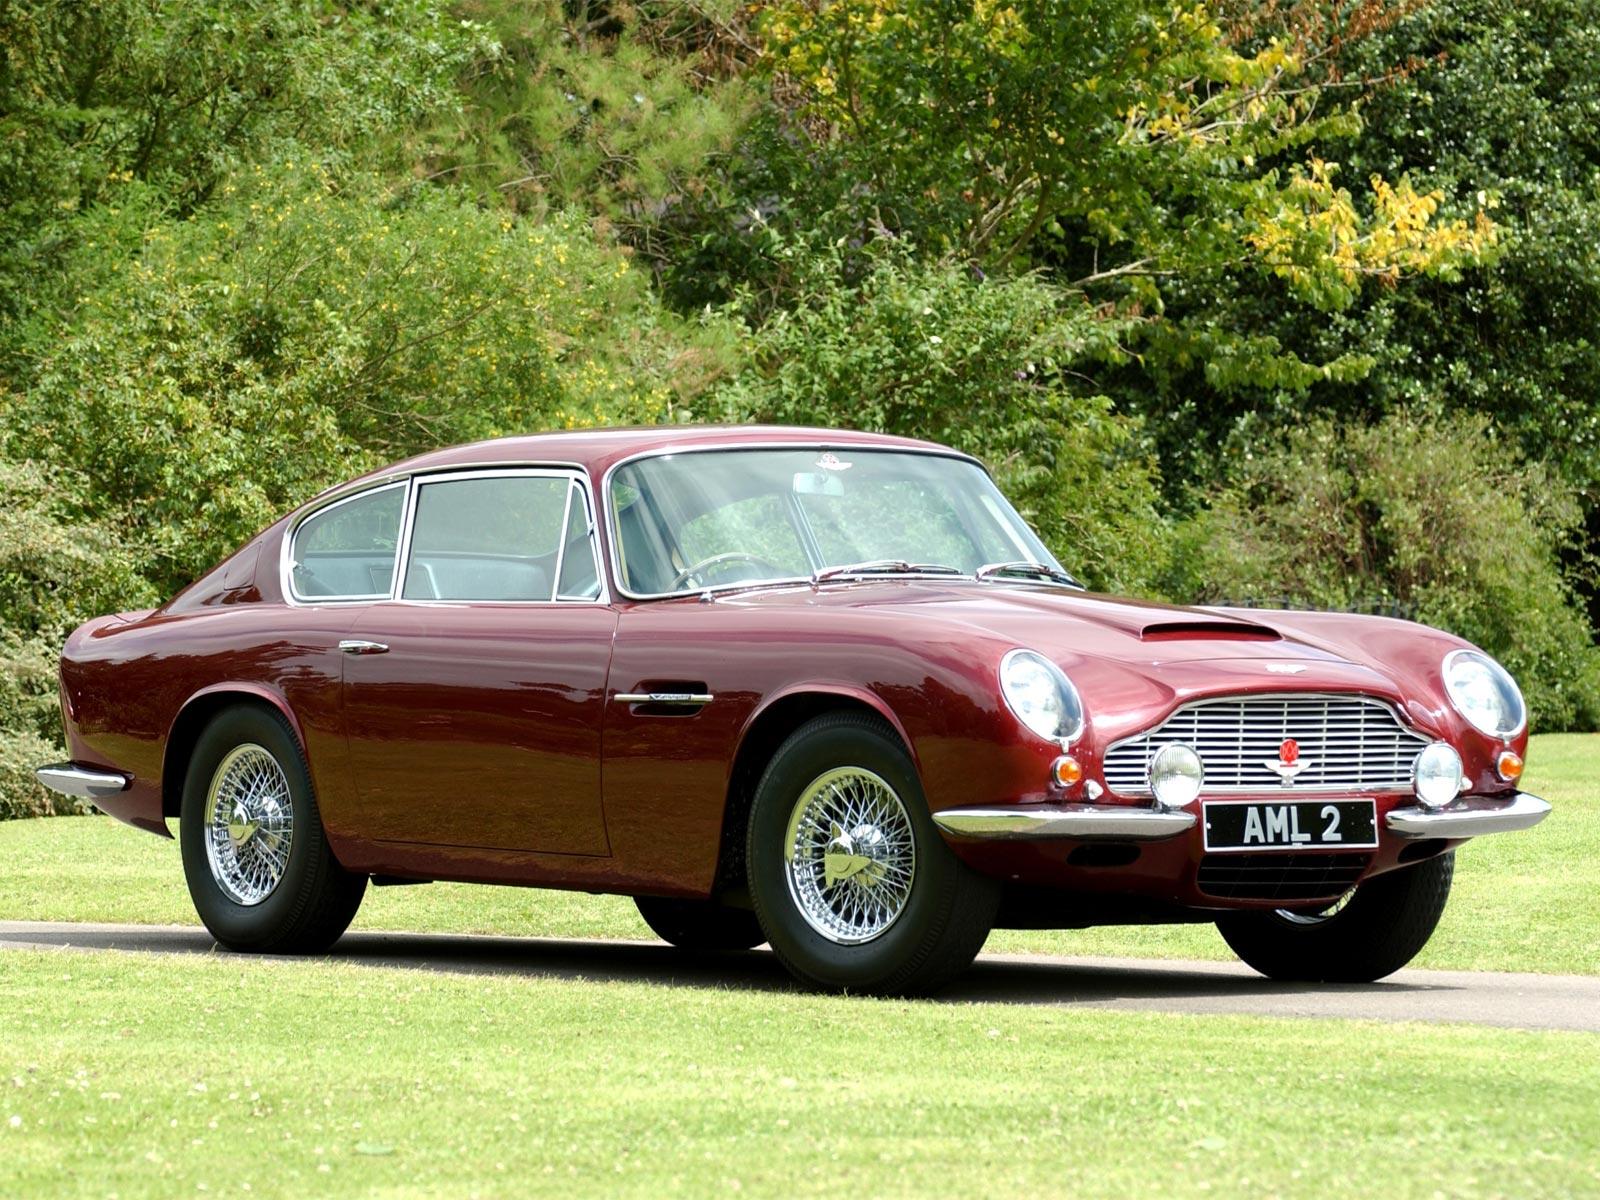 1969 Aston Martin DB6 Mk II (c) Aston Martin